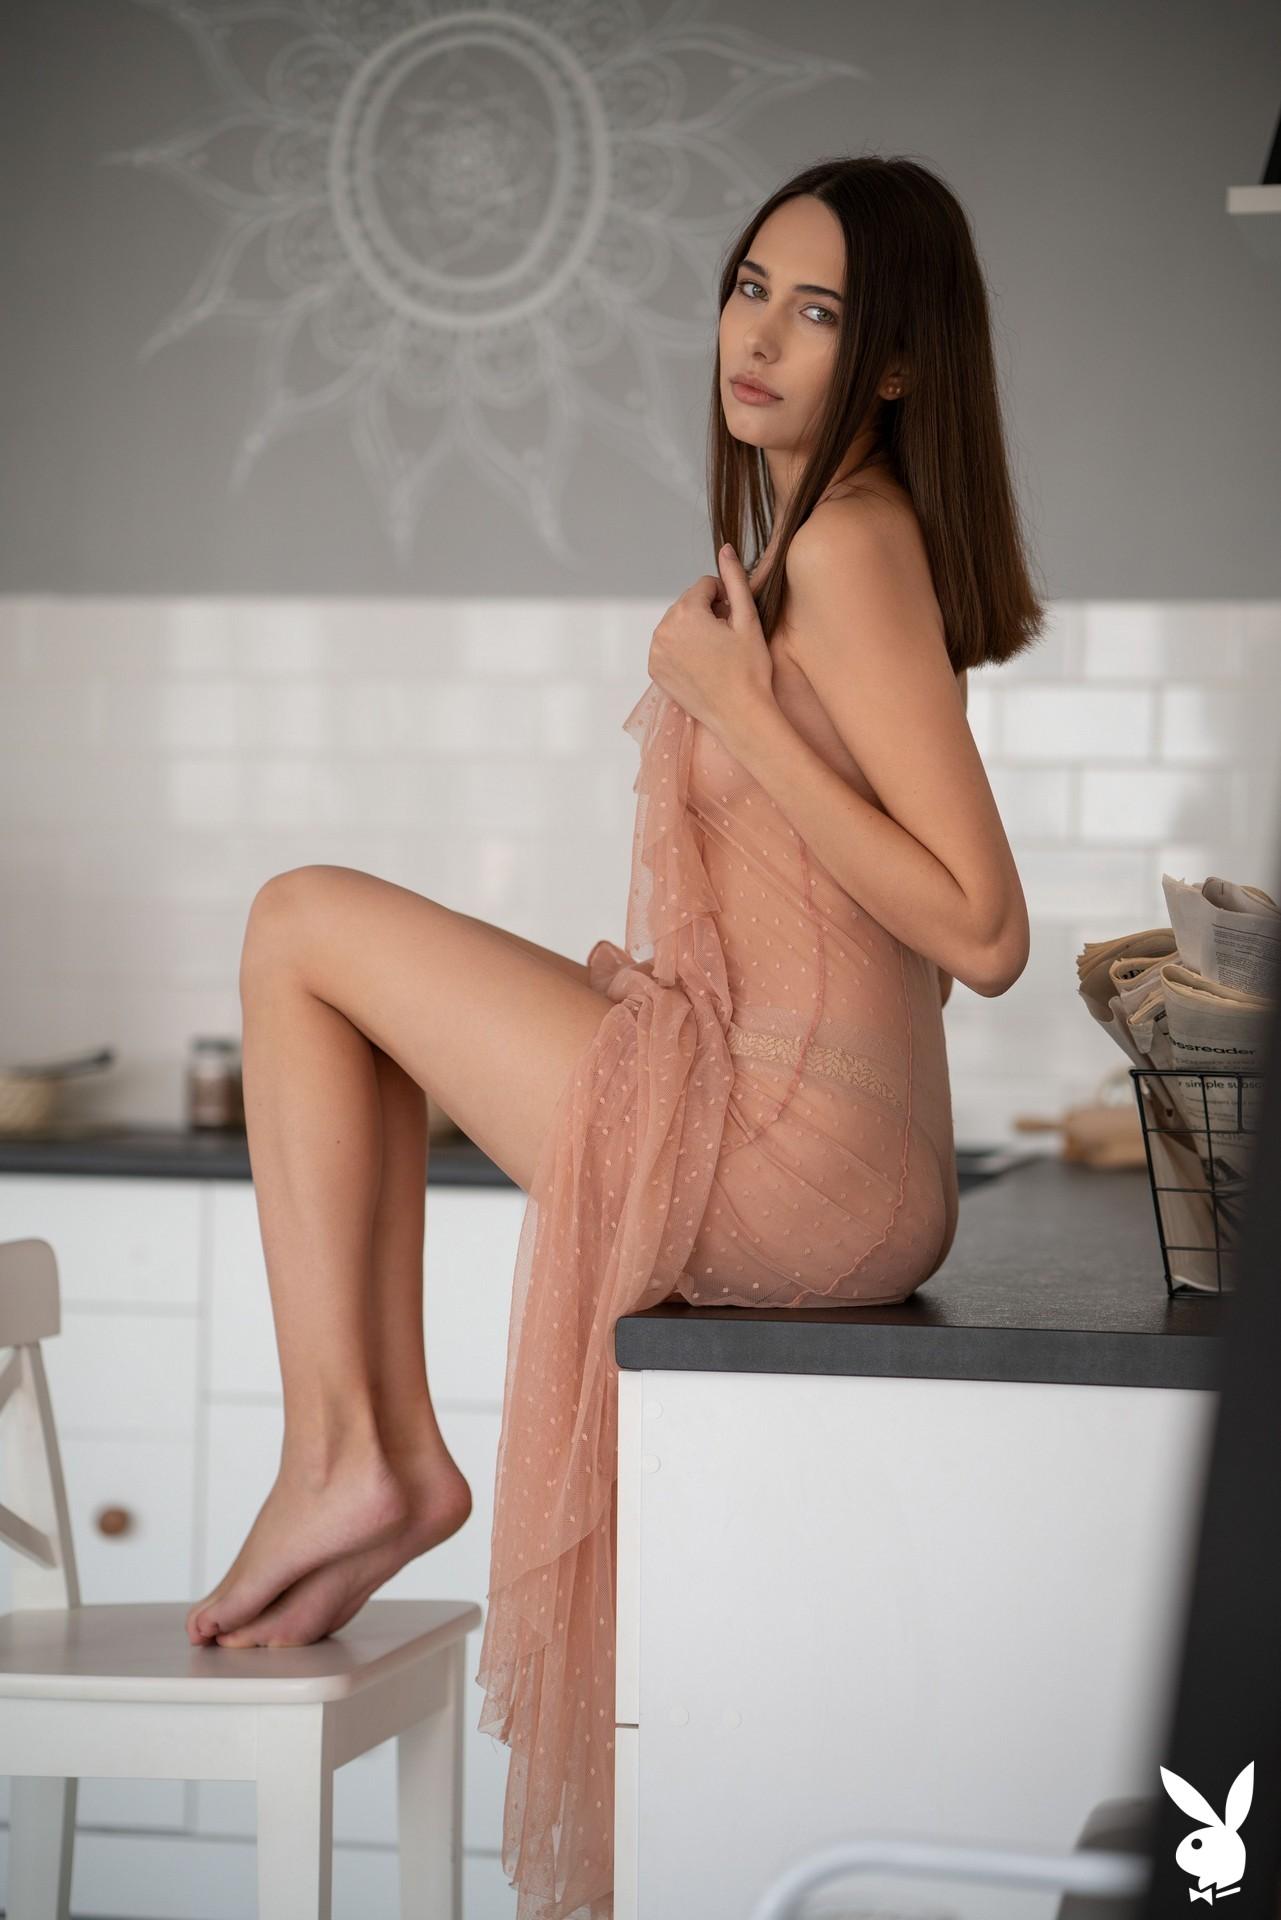 Katrine Pirs In Essence Of Life Playboy Plus (4)